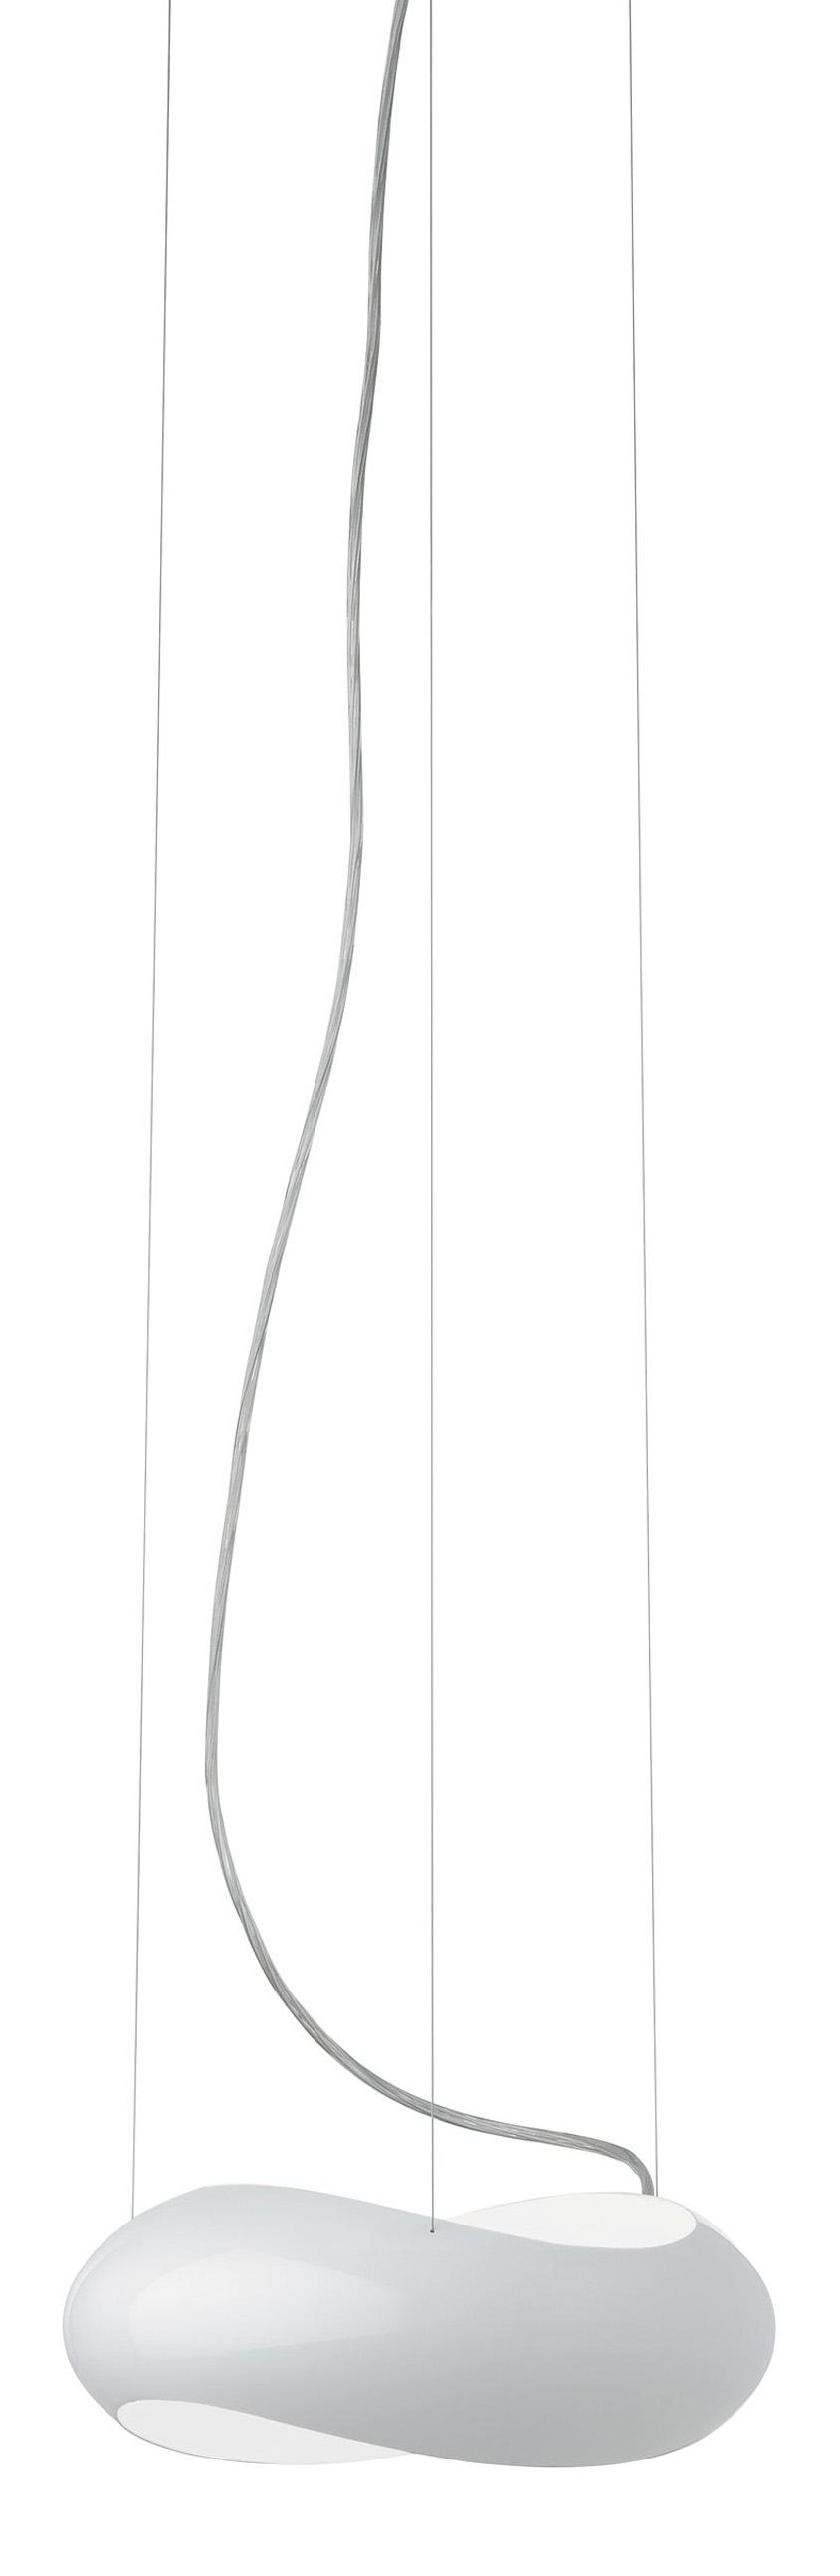 Infinity Lámpara Colgante Pequeño blanco